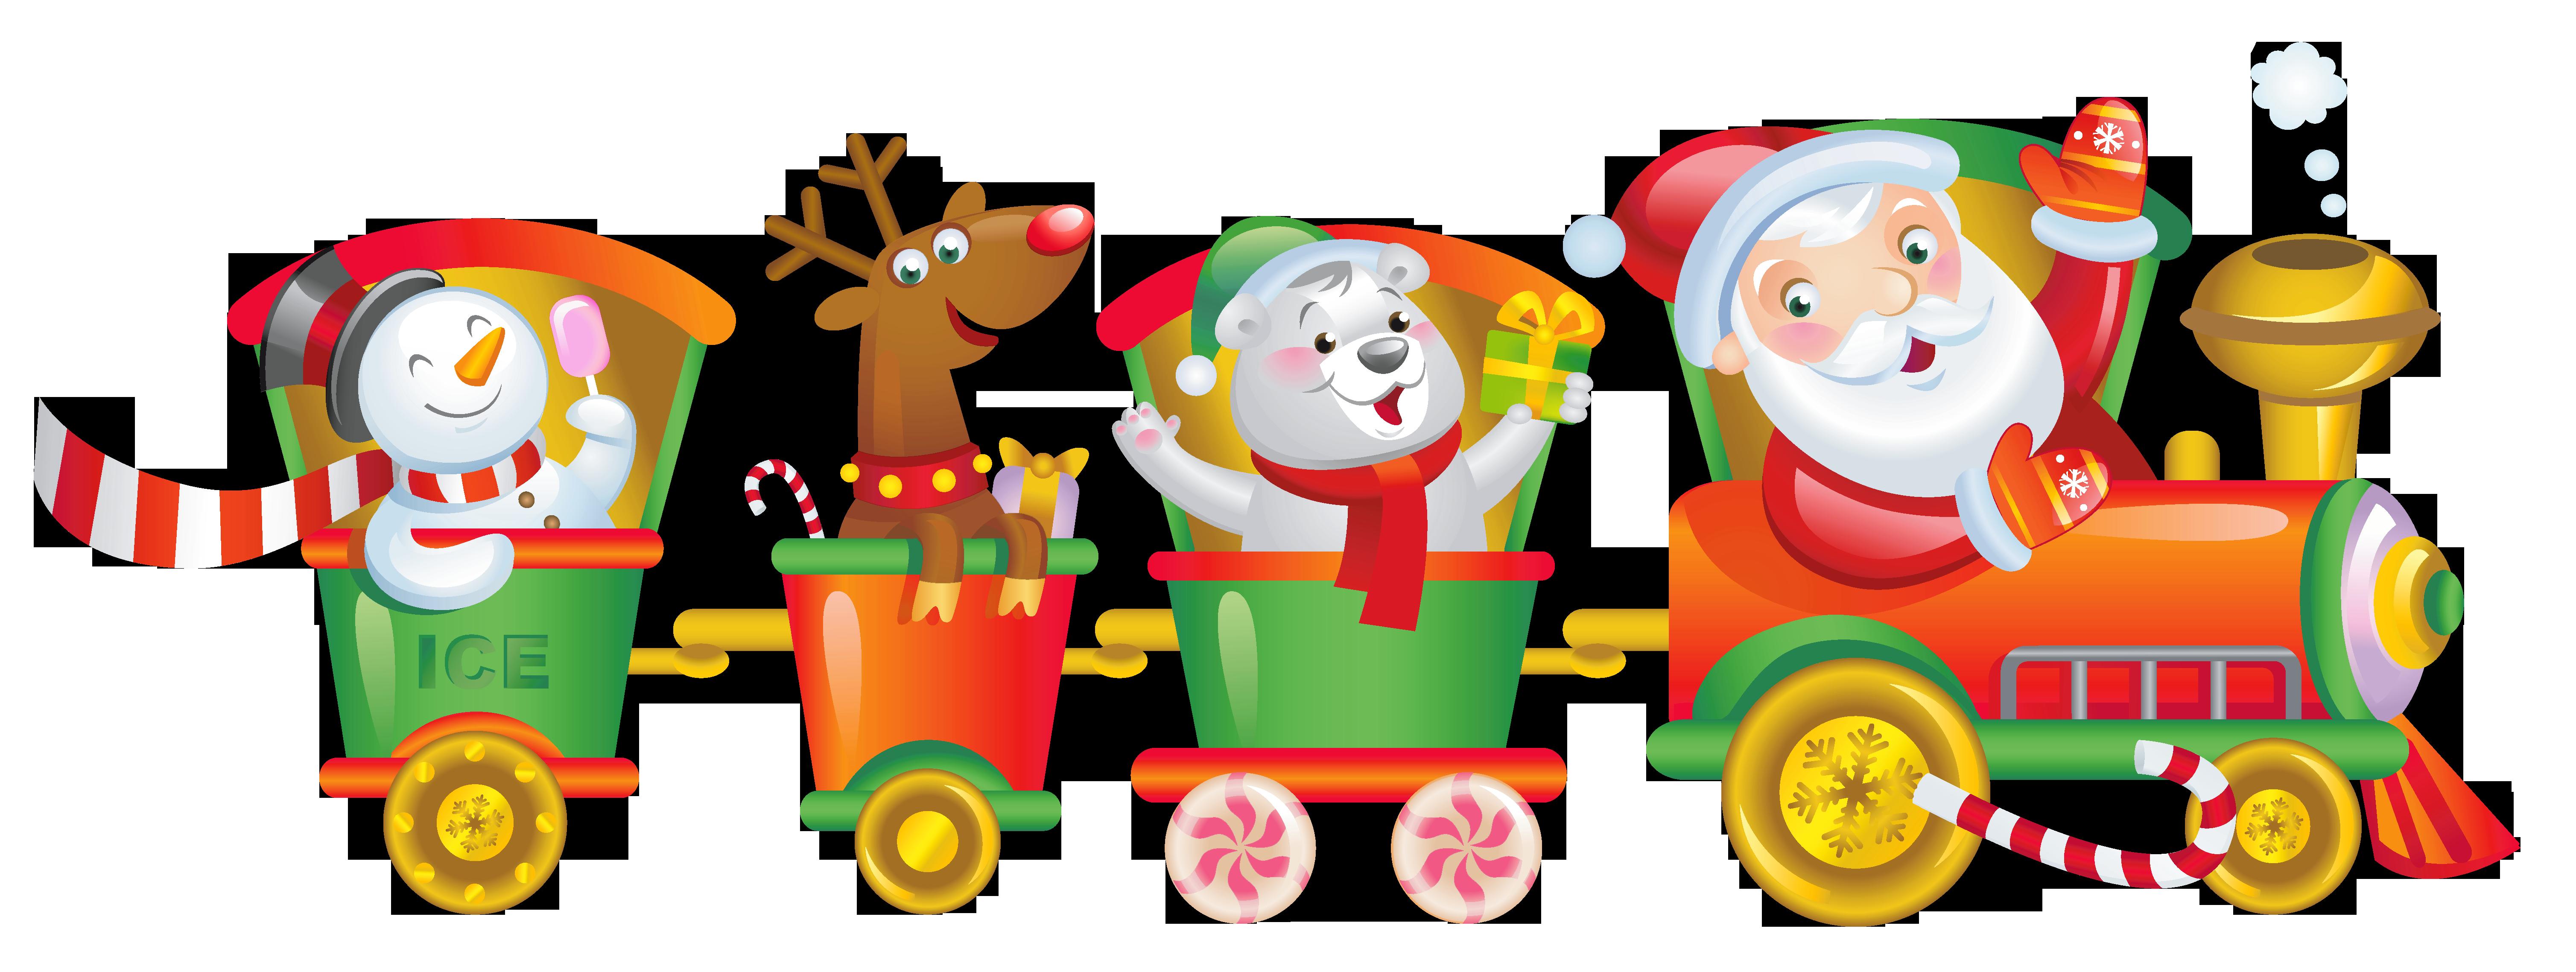 Christmas train clipart jpg royalty free stock 28+ Collection of Christmas Train Clipart   High quality, free ... jpg royalty free stock